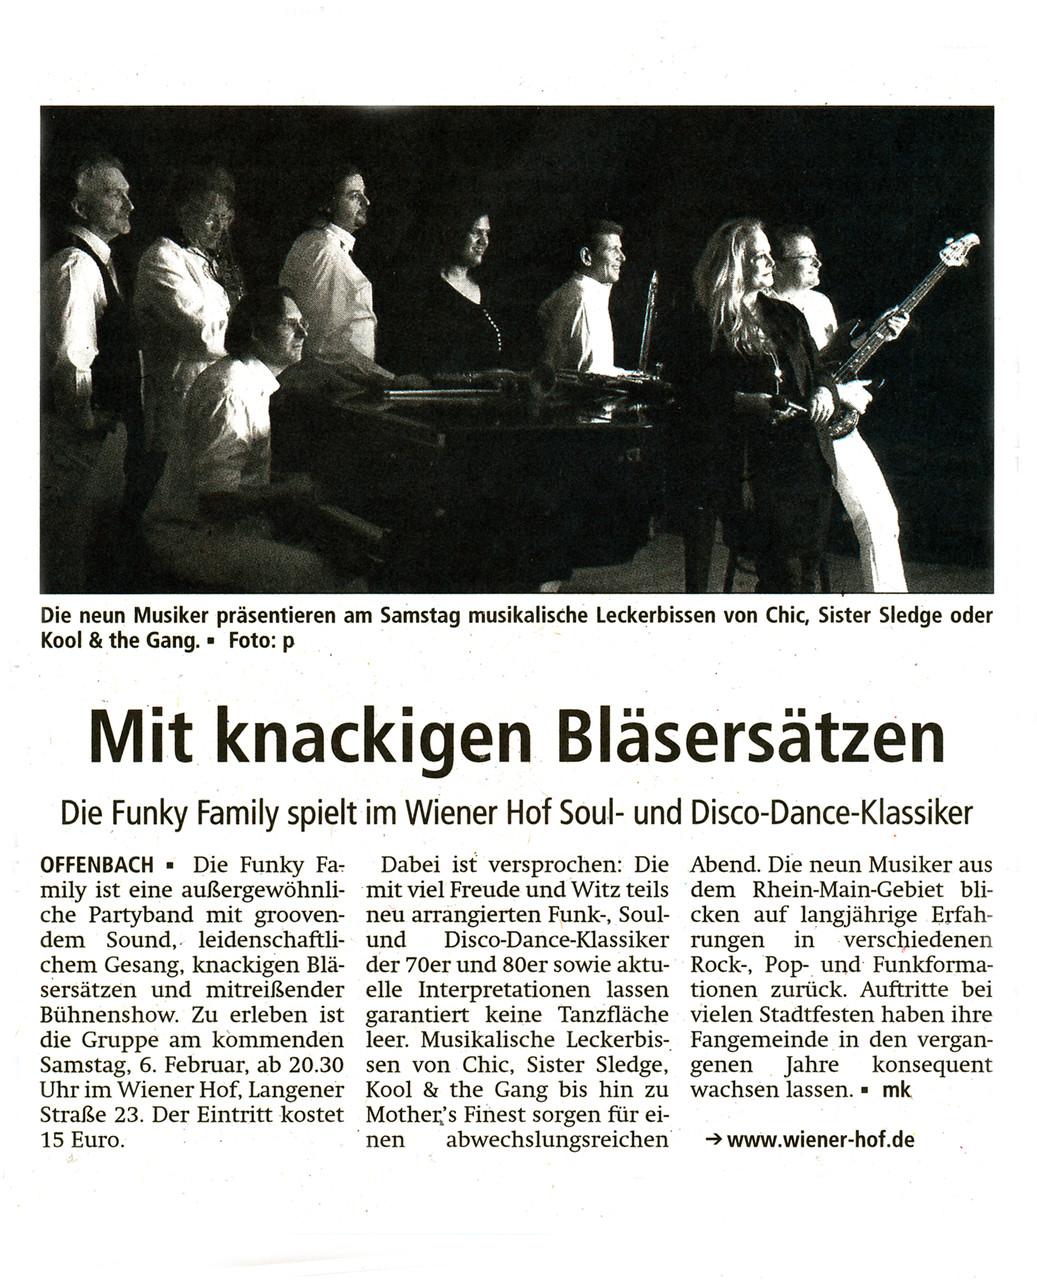 Offenbach Post, 3. Februar 2016